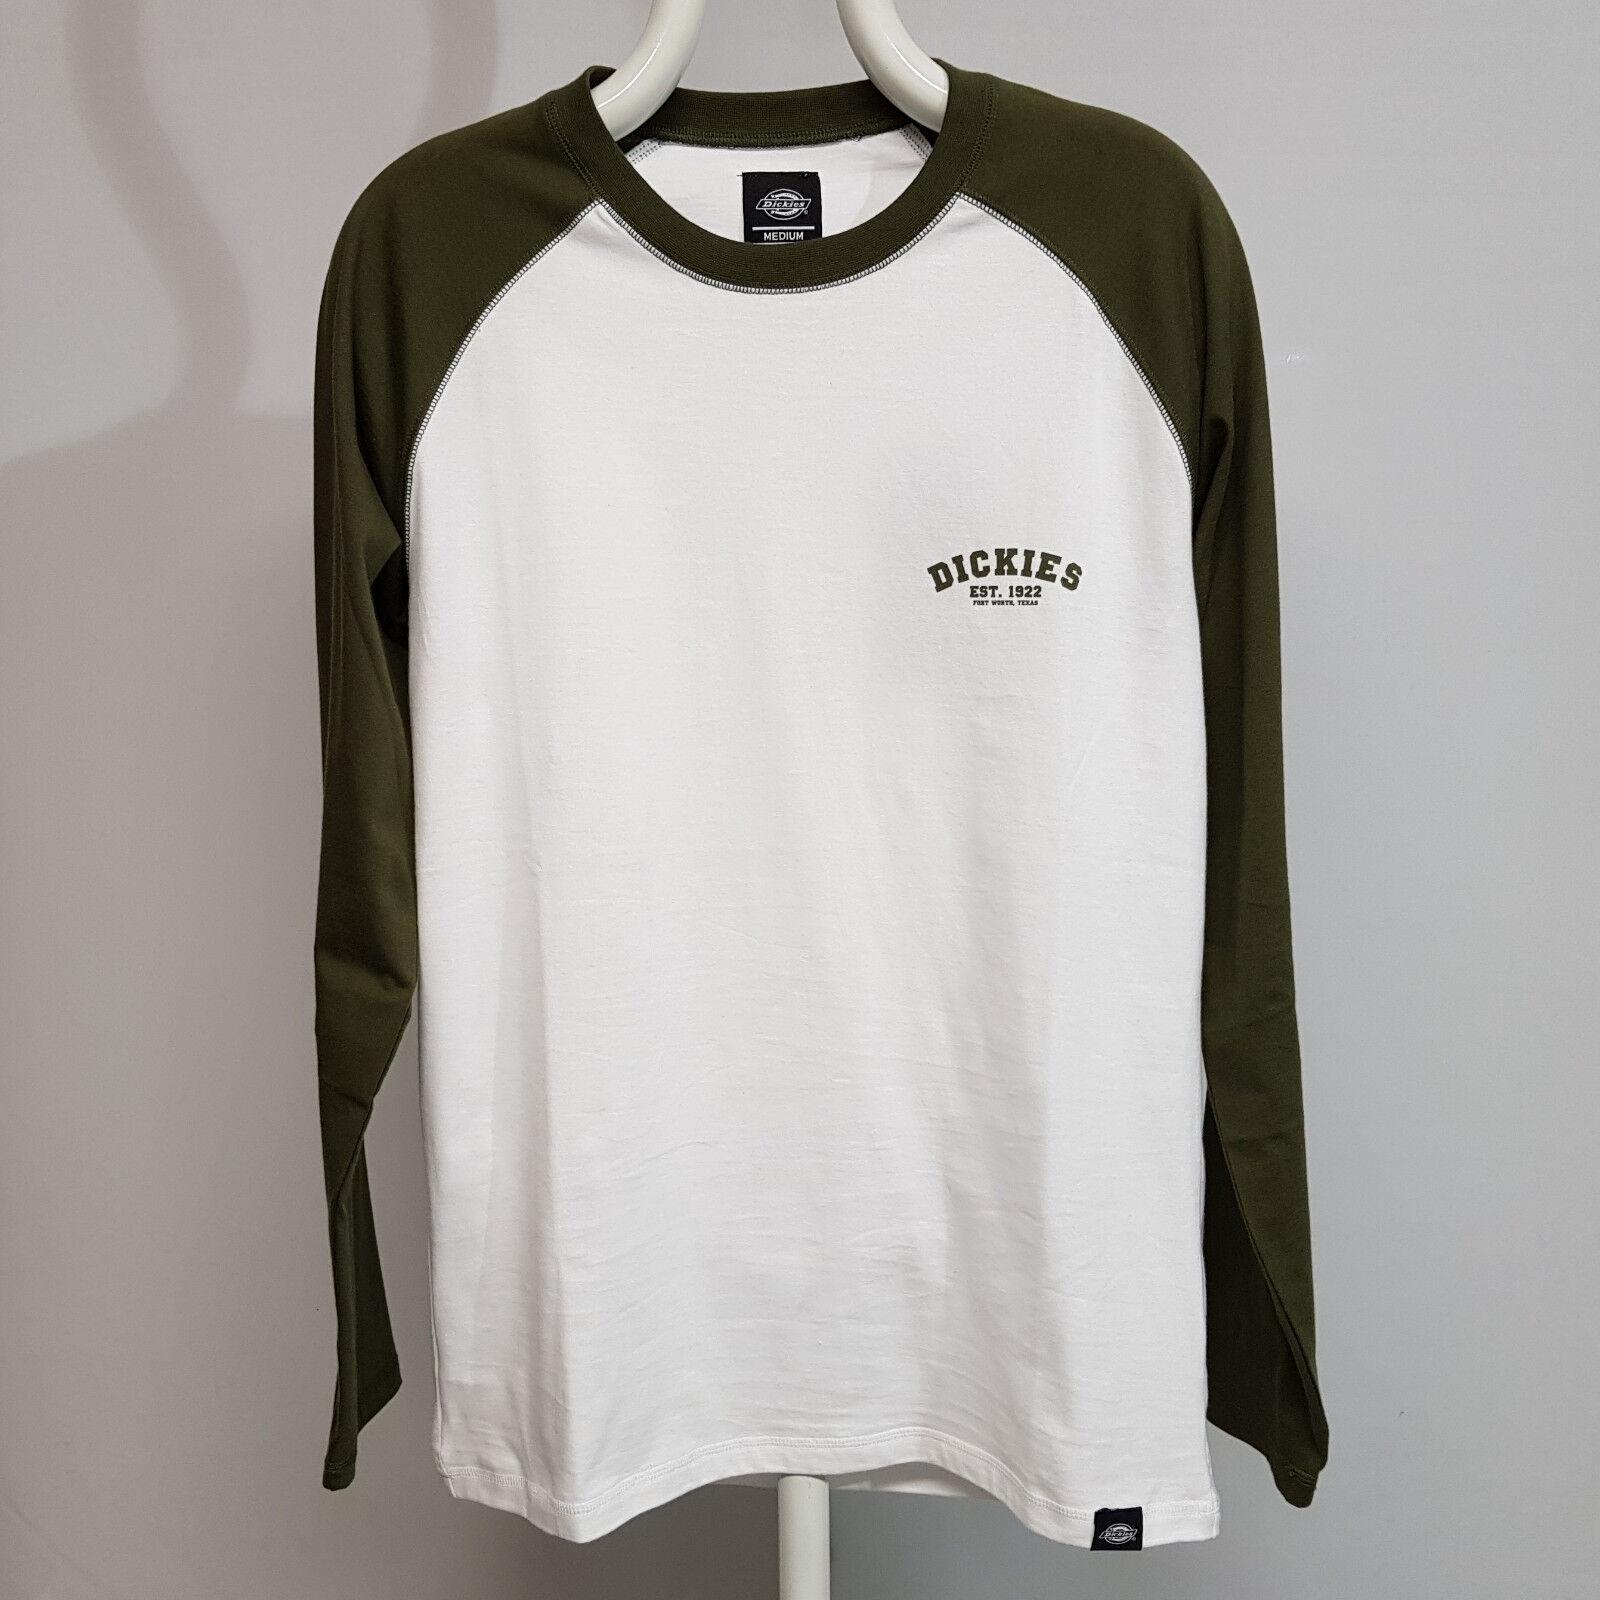 Dickies Baseball Longsleeve Shirt Dark Olive 06-210275 T-Shirt Herren grün weiß